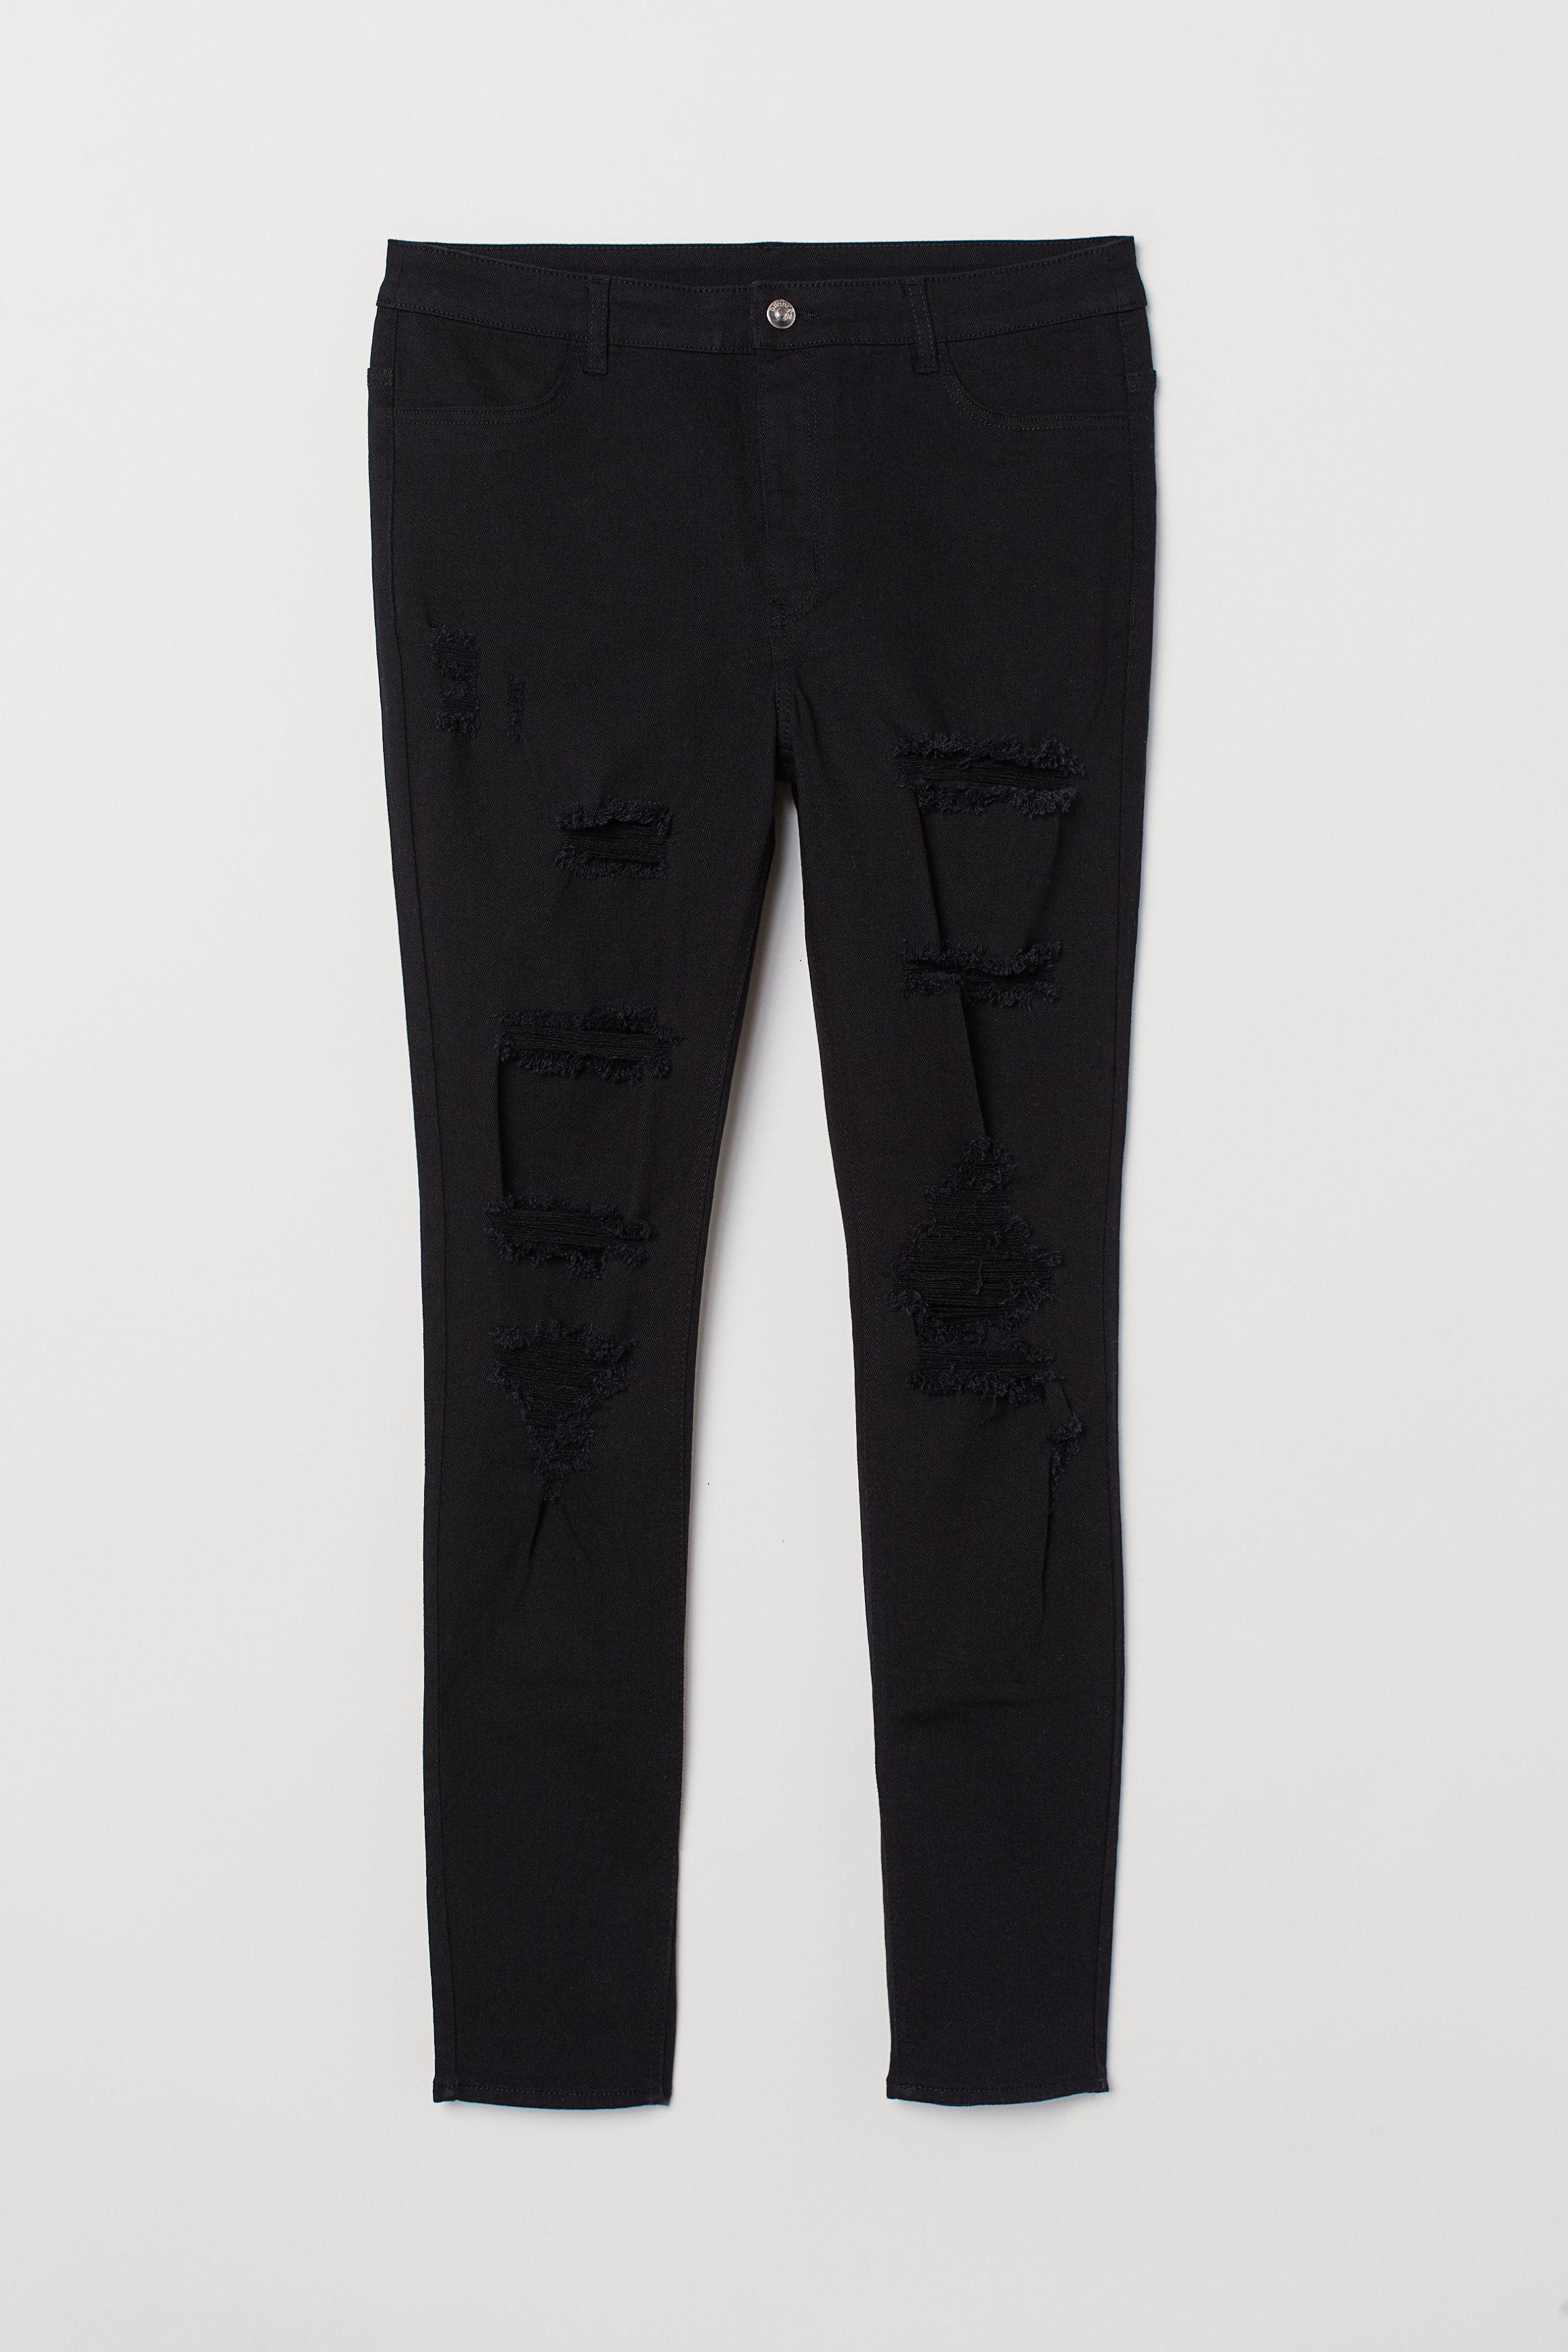 9a236136bb H&M+ Skinny High Waist Jeans - Black - Ladies | H&M US